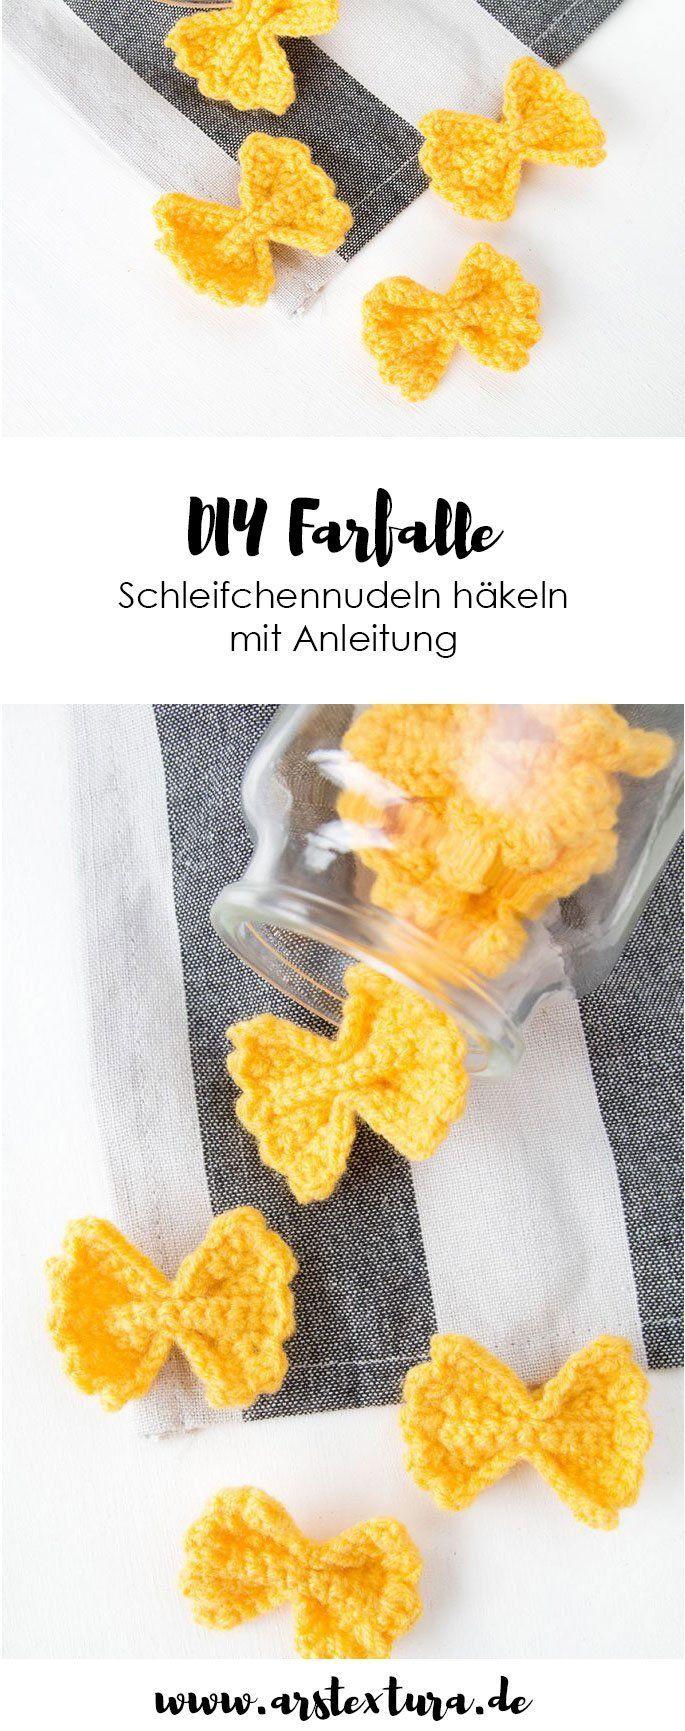 Photo of Anleitung: Farfalle Pasta häkeln | ars textura – DIY-Blog, # ANWEISUNGEN #ars